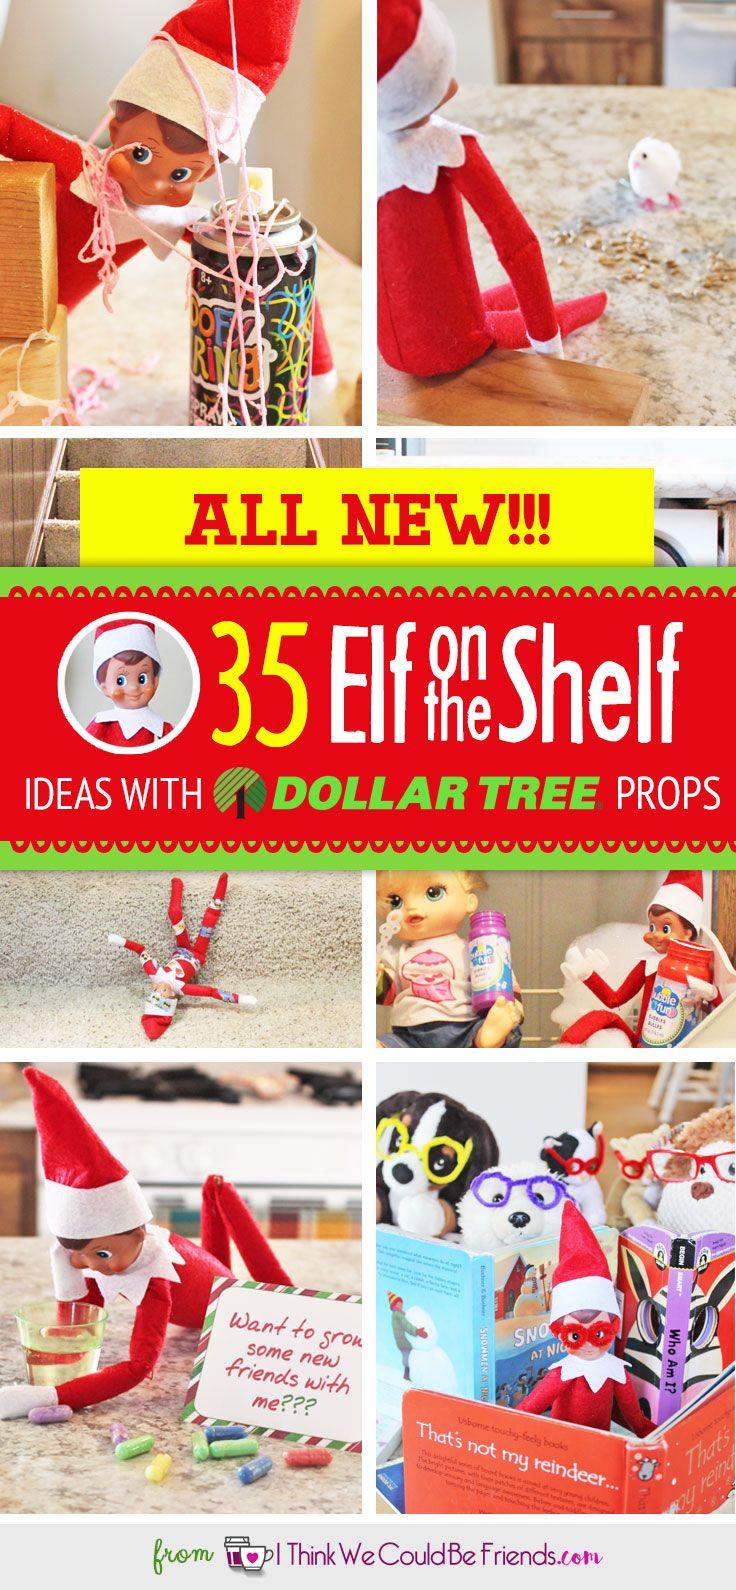 2017 Elf on the Shelf ideas with Dollar Tree items